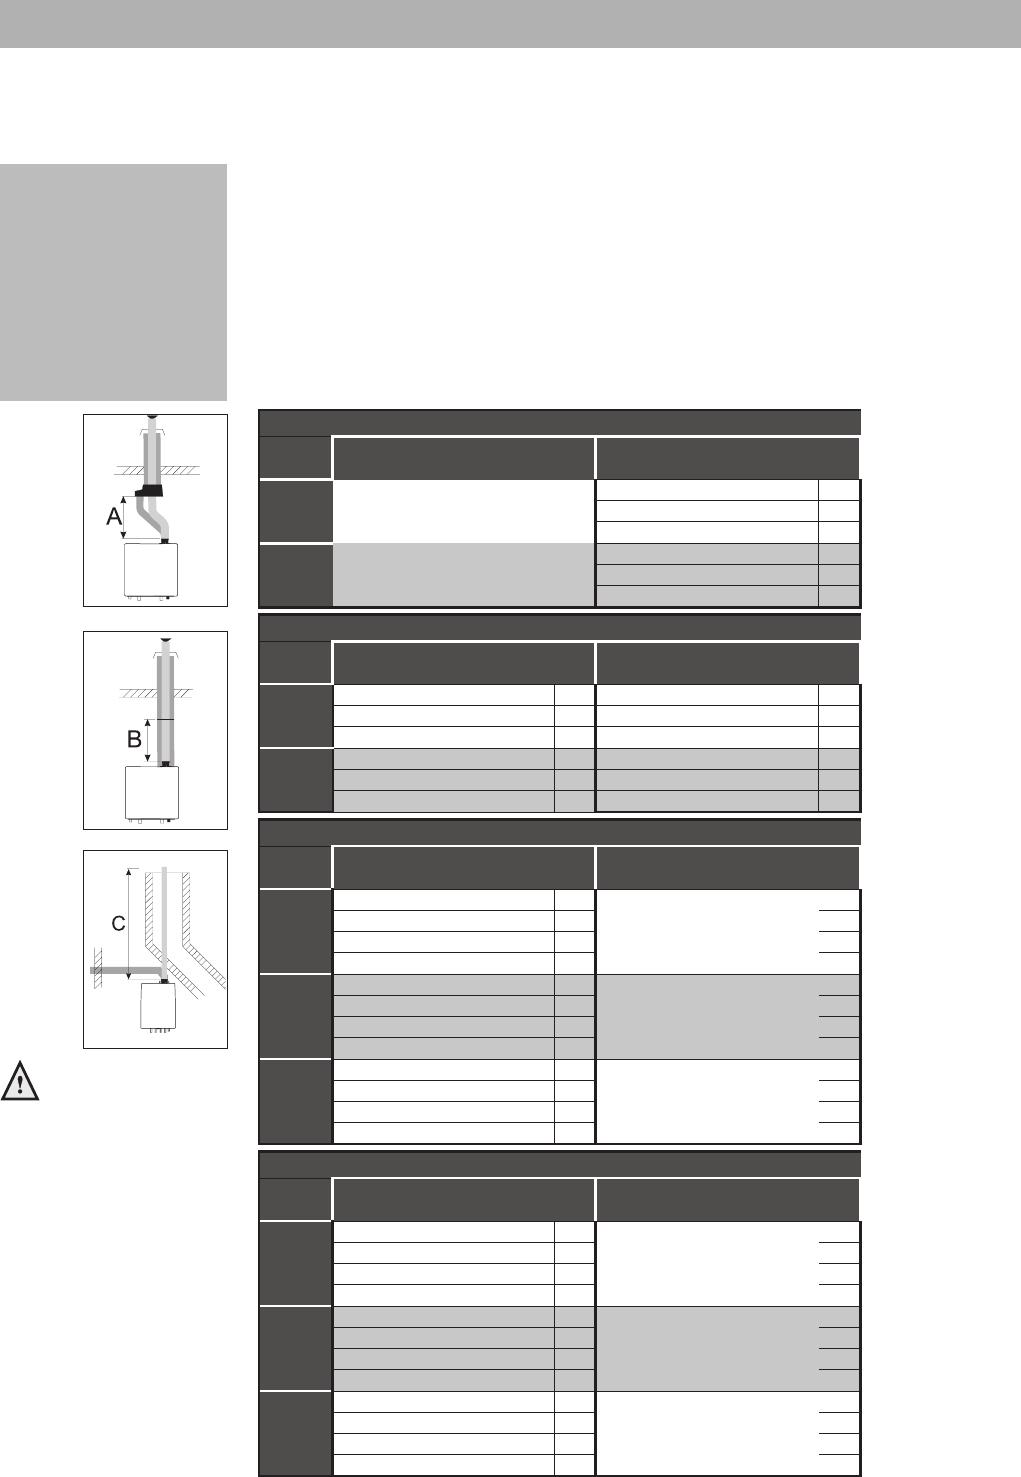 Voorkeur Handleiding ATAG A244EC-CW4 (pagina 19 van 36) (Nederlands) HH67